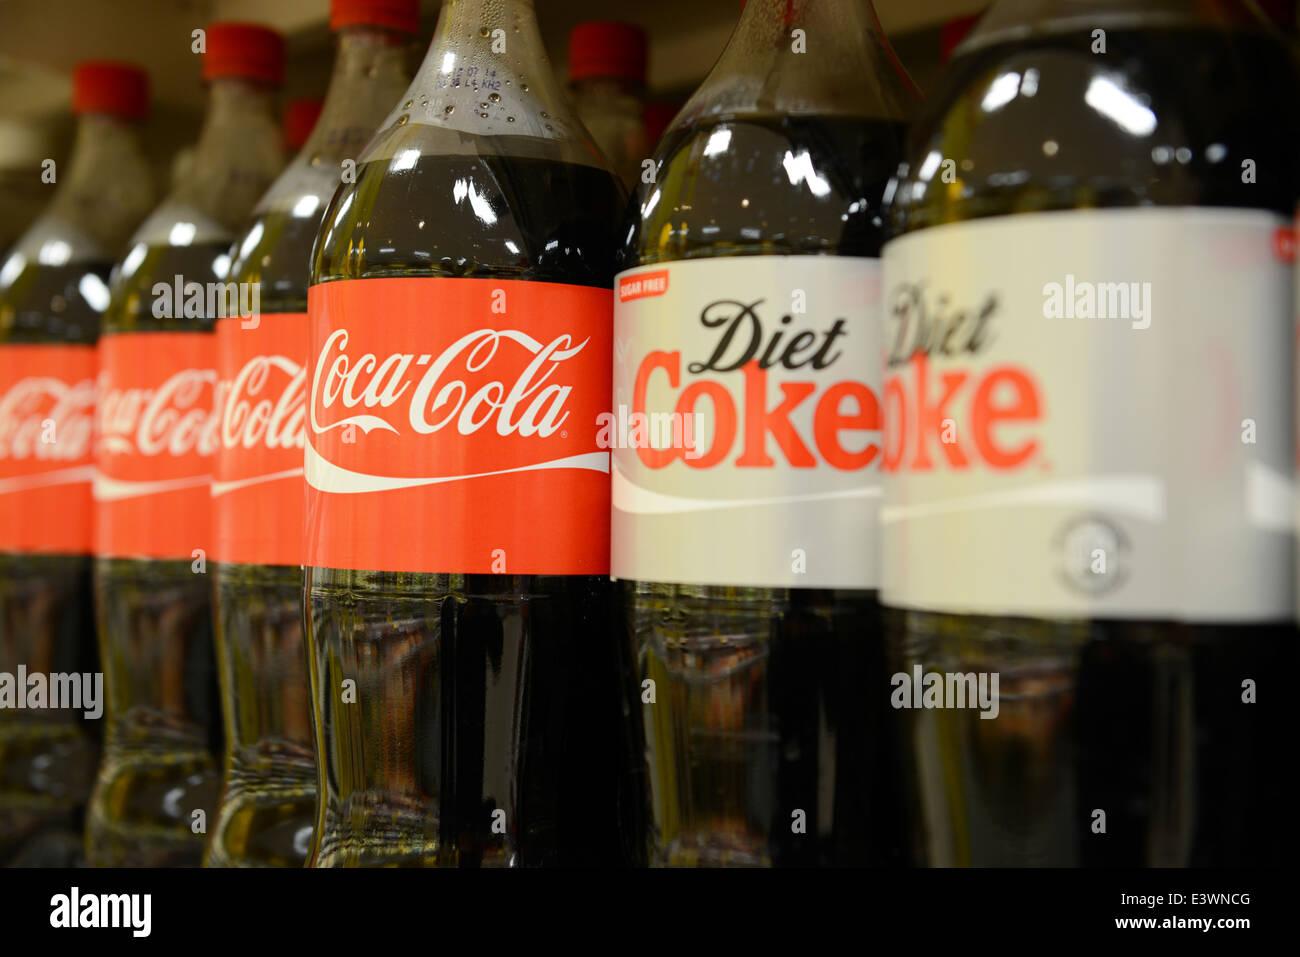 Coca Cola and Diet Coke bottles - Stock Image